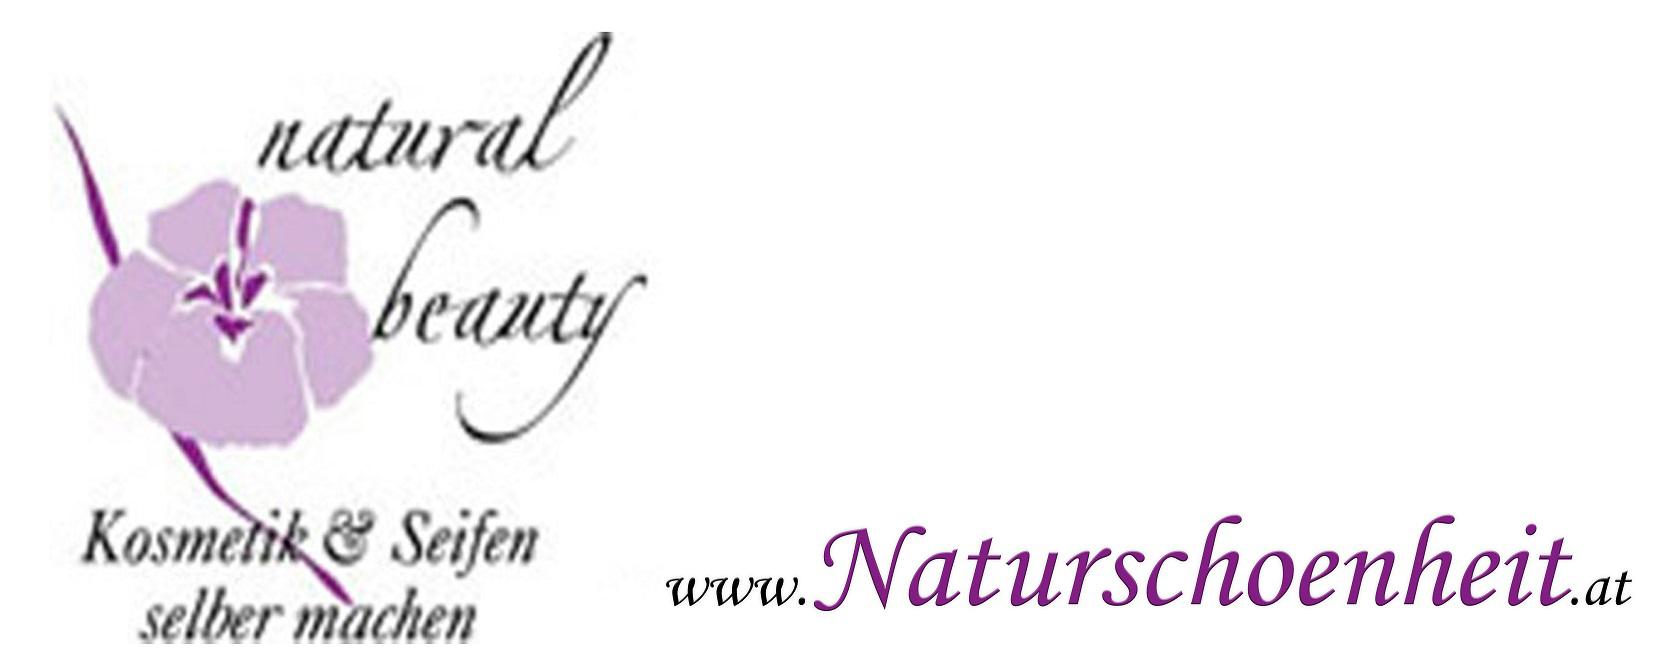 (c) Naturschoenheit.at